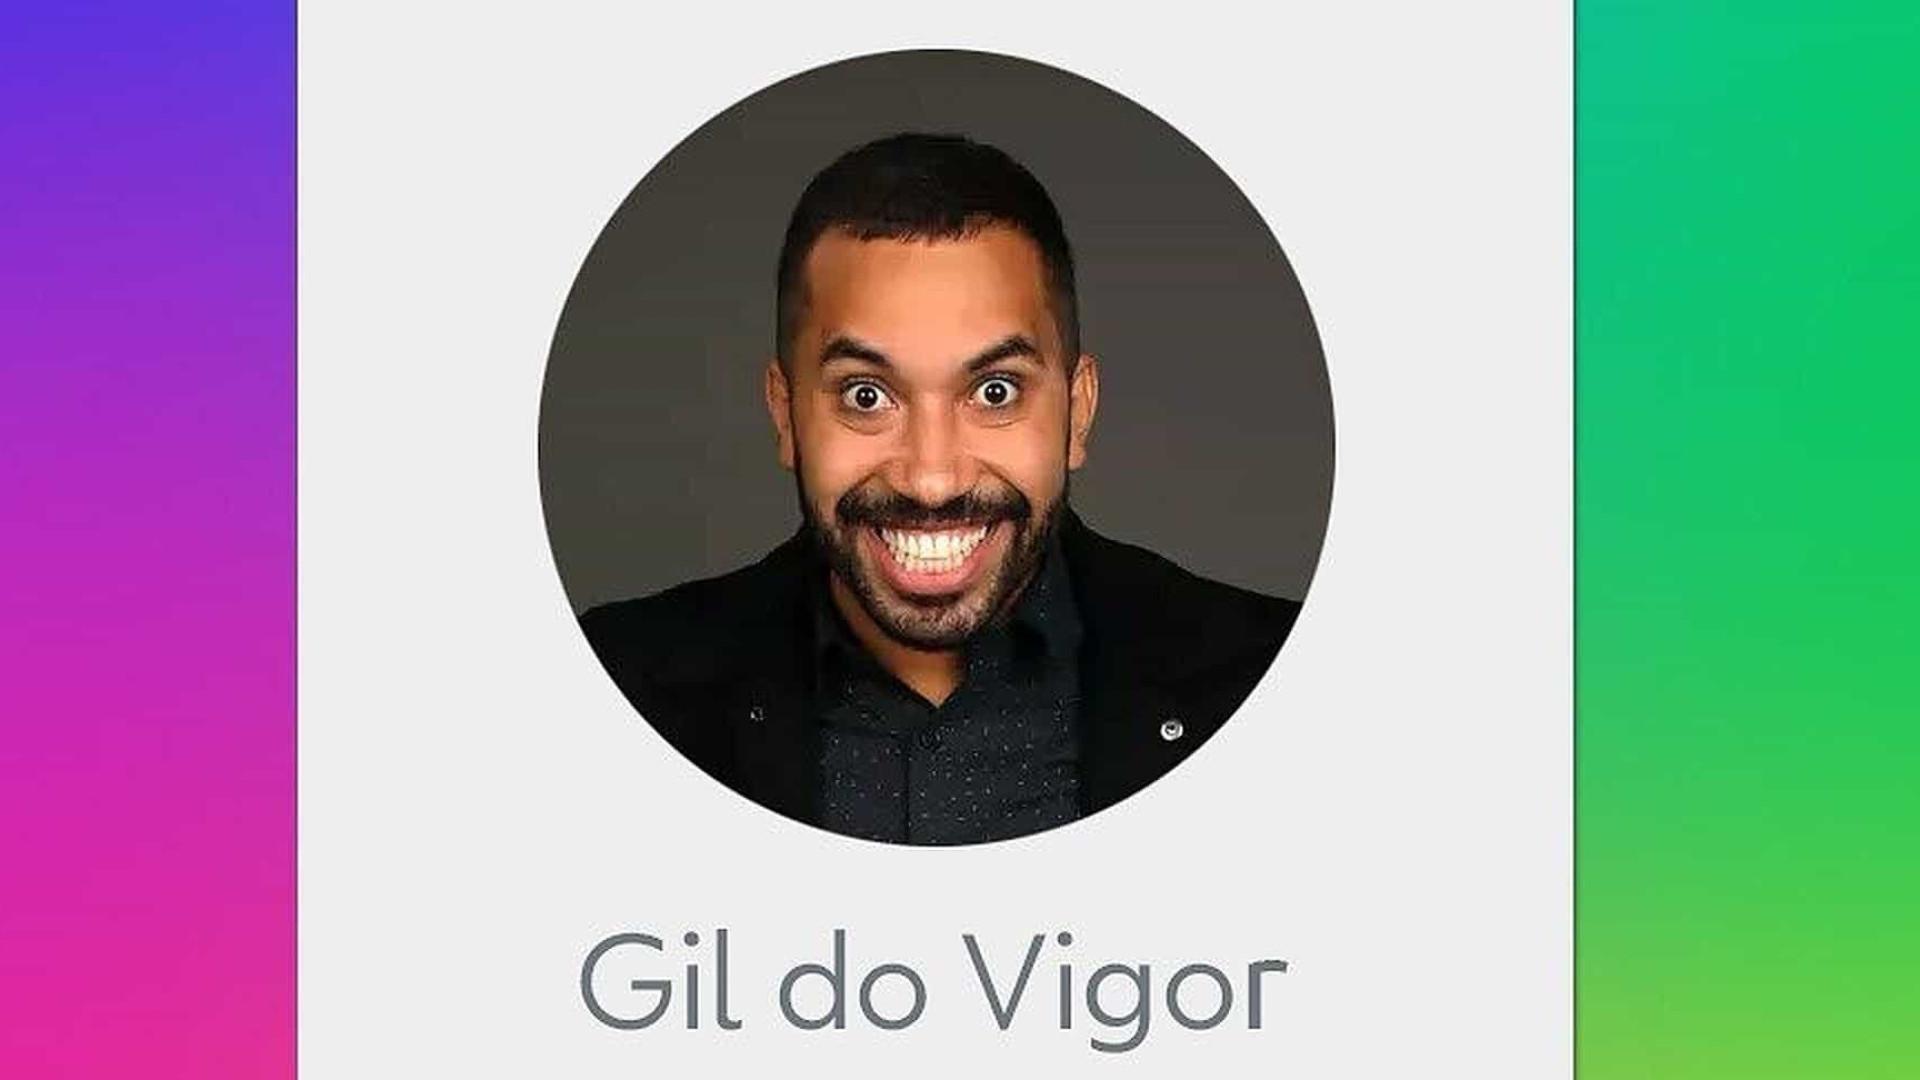 Gil do Vigor se emociona ao receber primeiro exemplar de seu livro